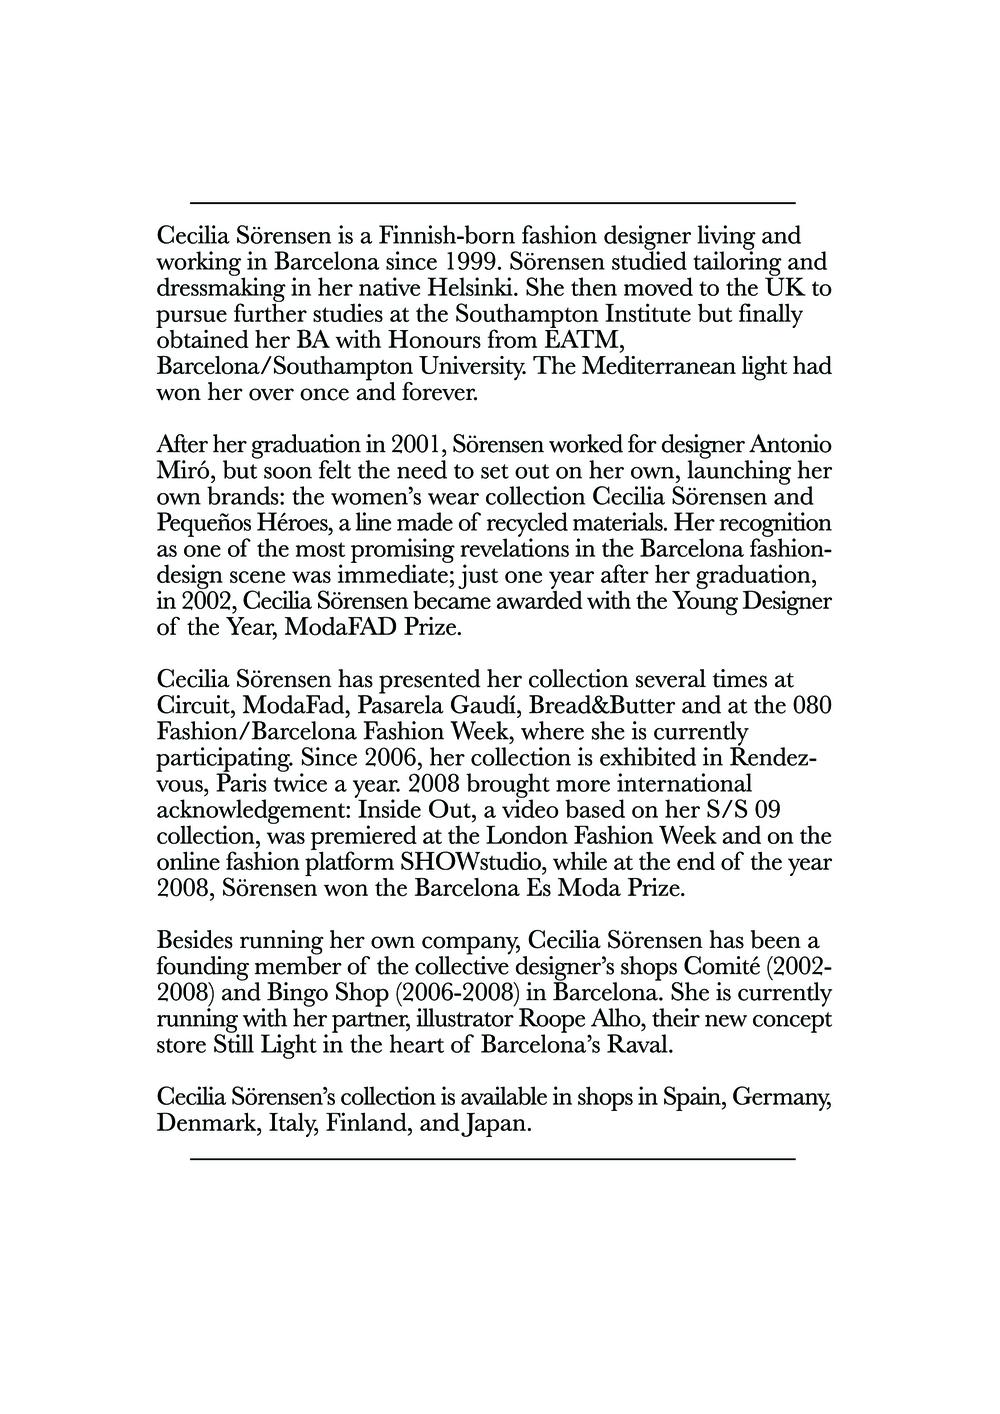 CS page 2.jpg